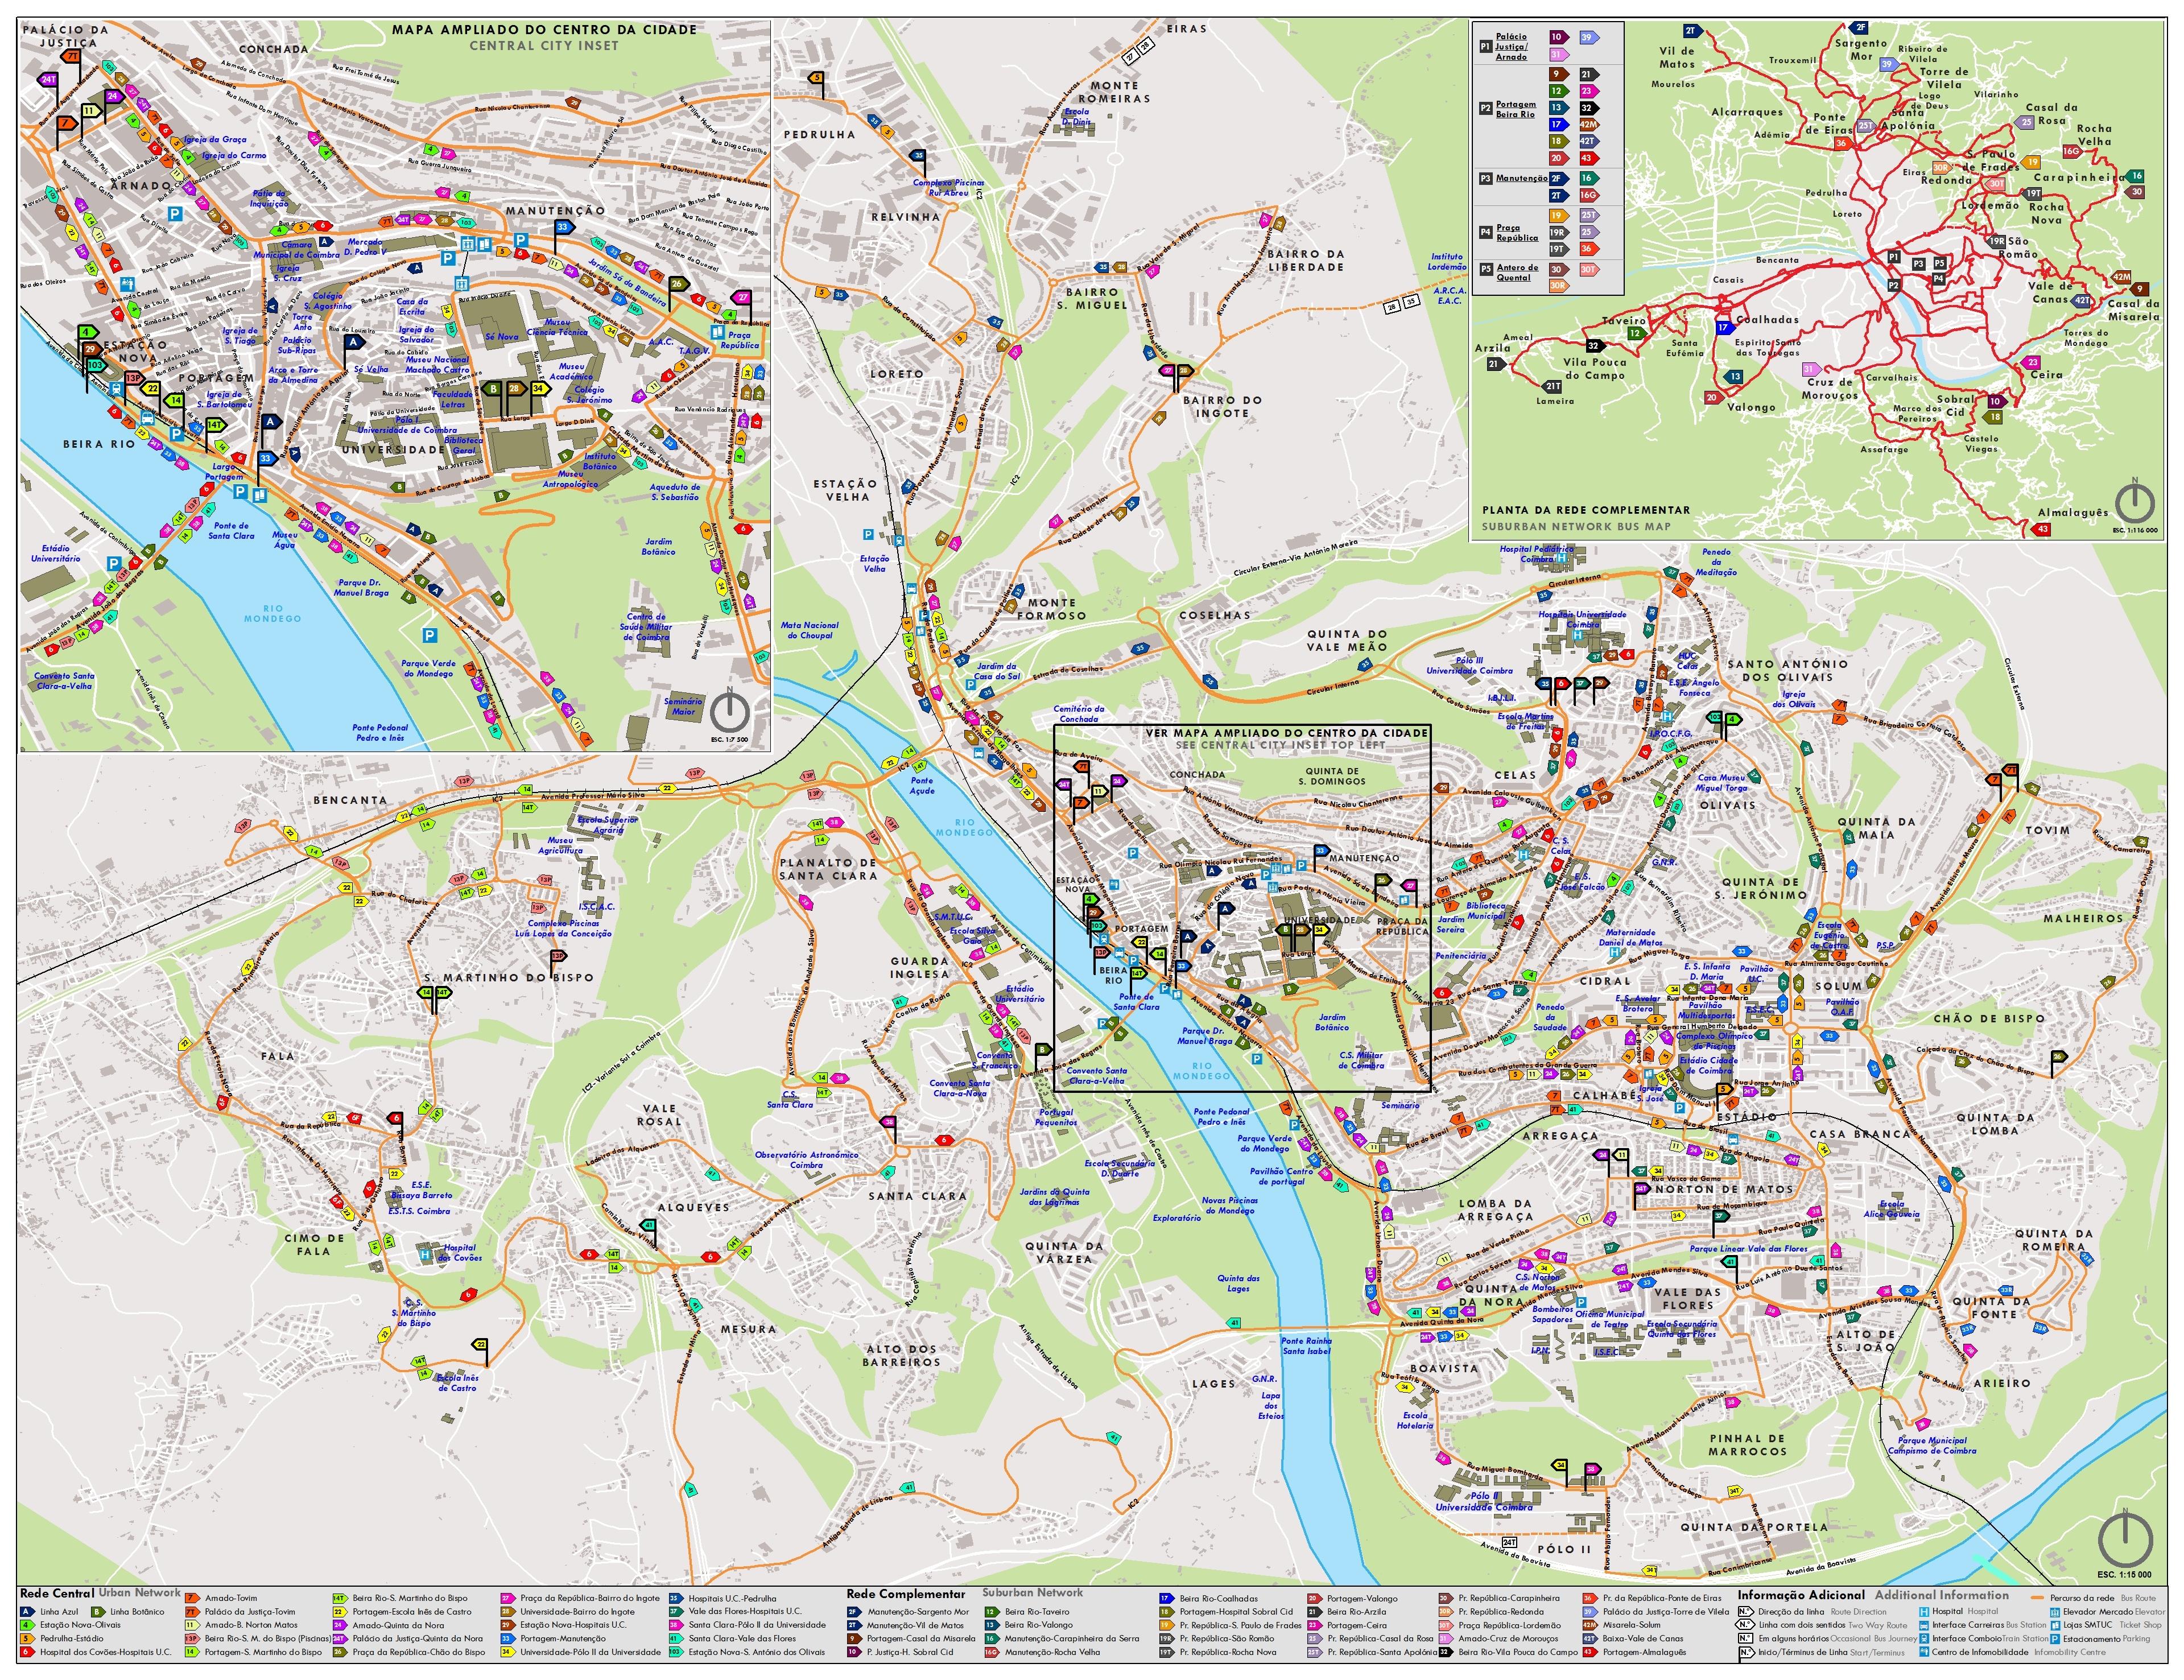 Mapa-redeTransportes